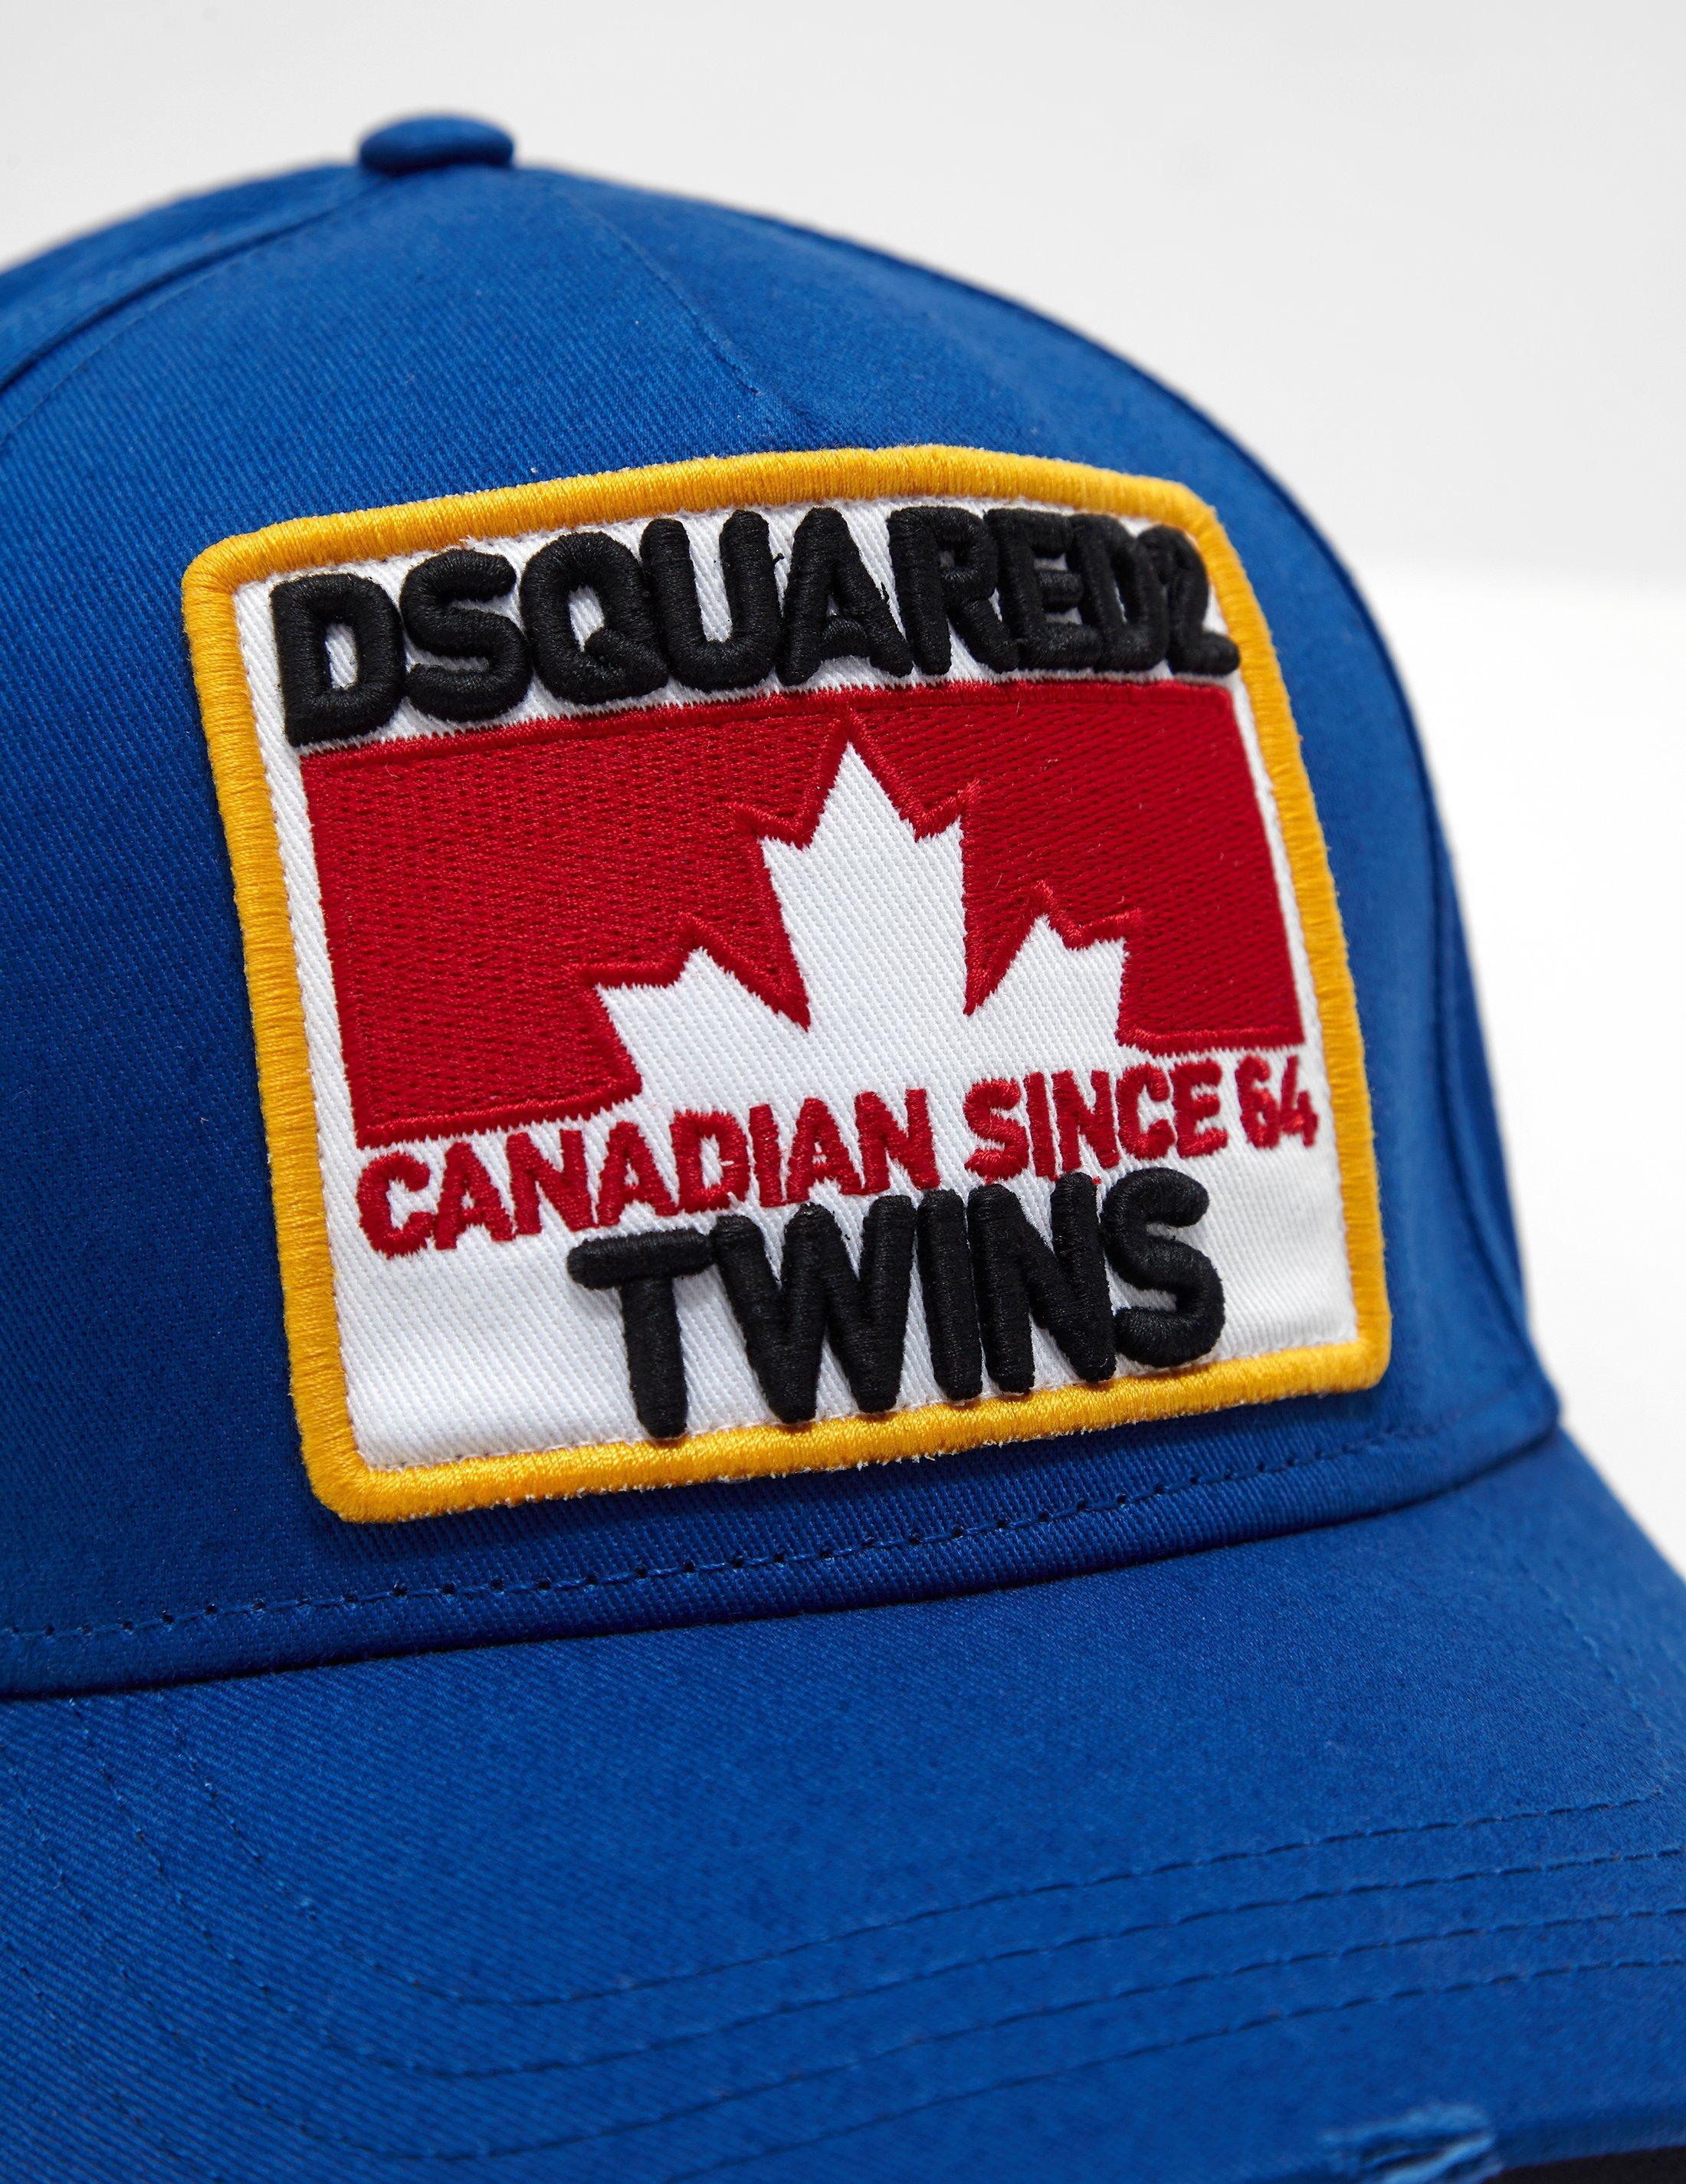 Lyst - Dsquared² Mens Maple Square Cap Blue in Blue for Men 528767521b18